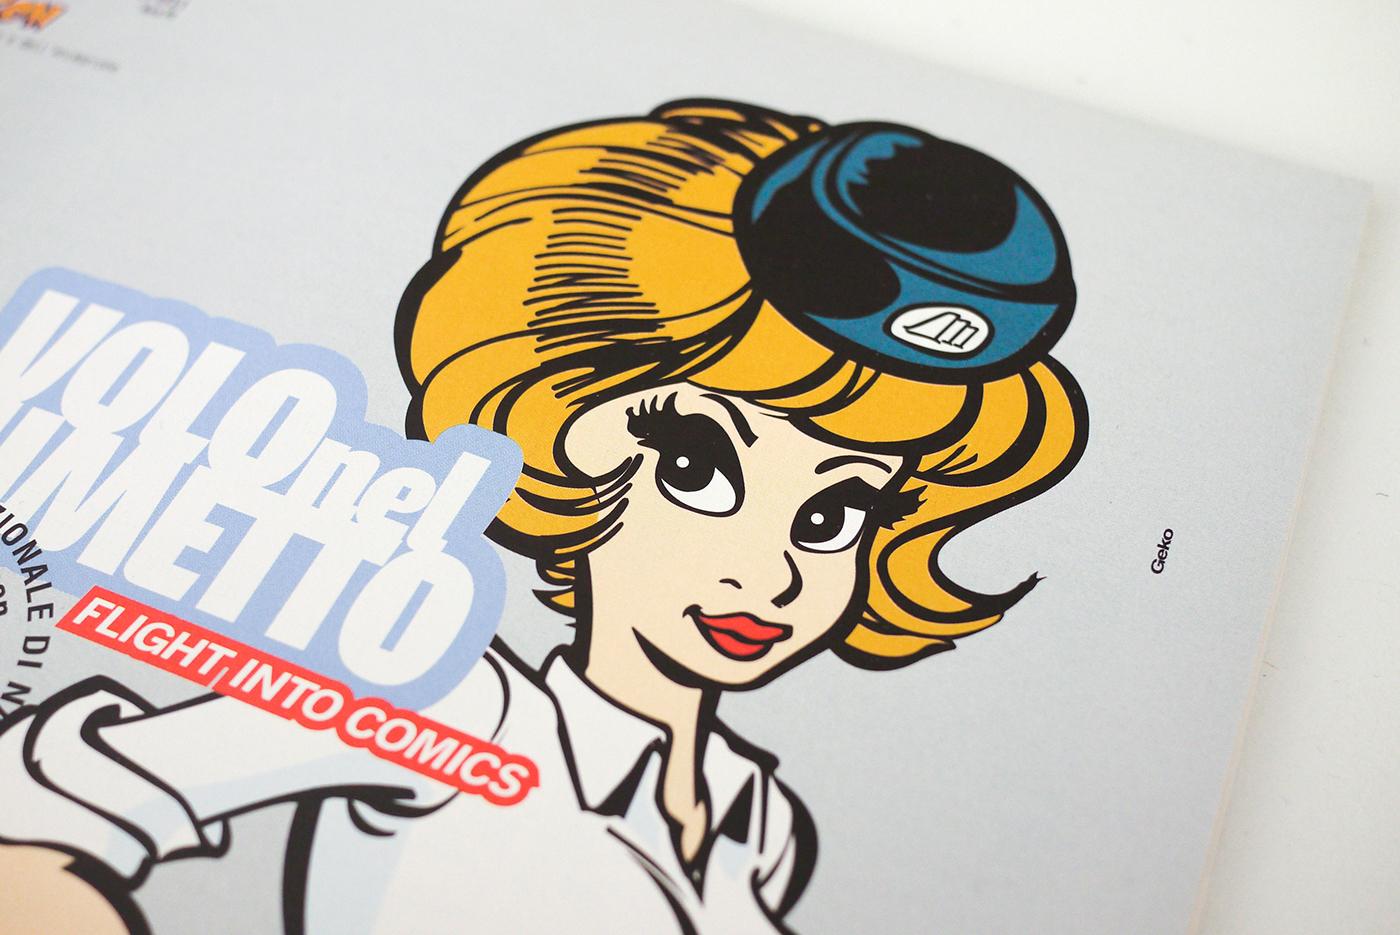 Comix  event  Graphic  design comics